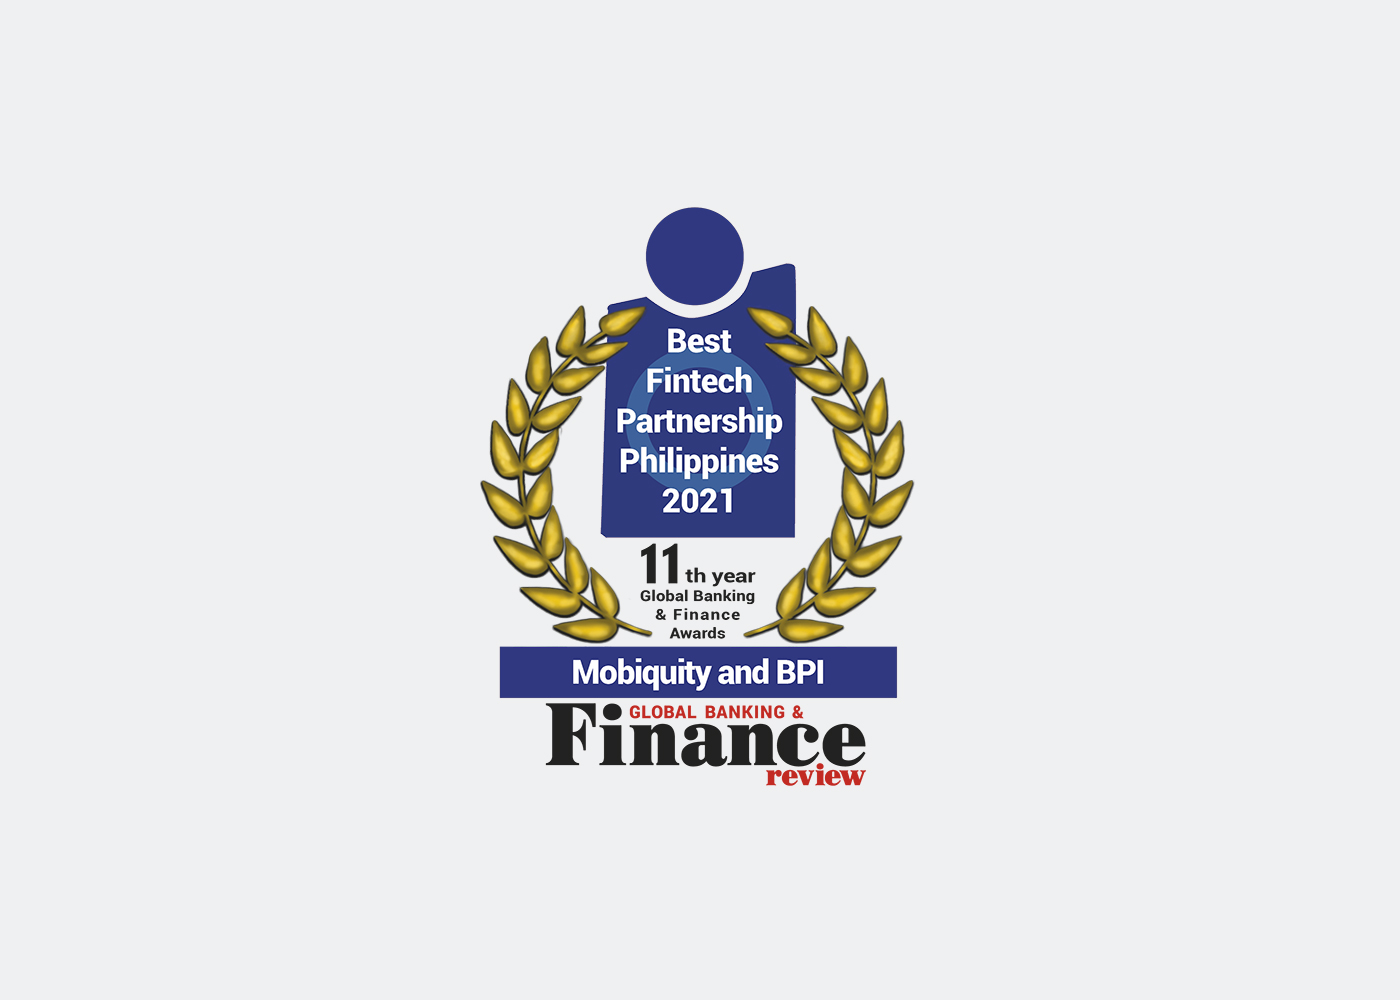 Best-Fintech-Partnership-Philippines-2021-blog